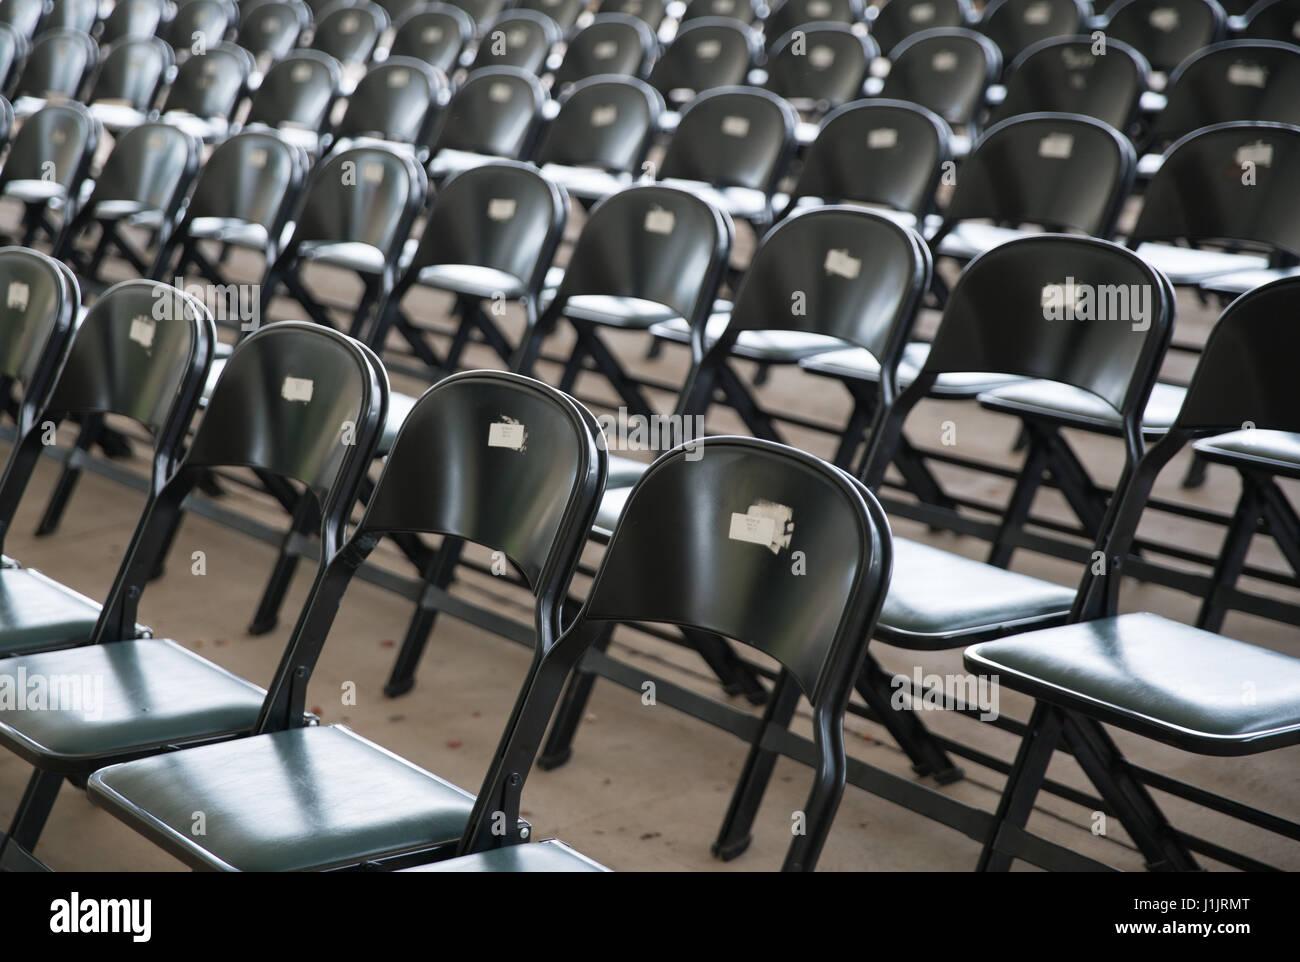 Amphitheater seating - Stock Image